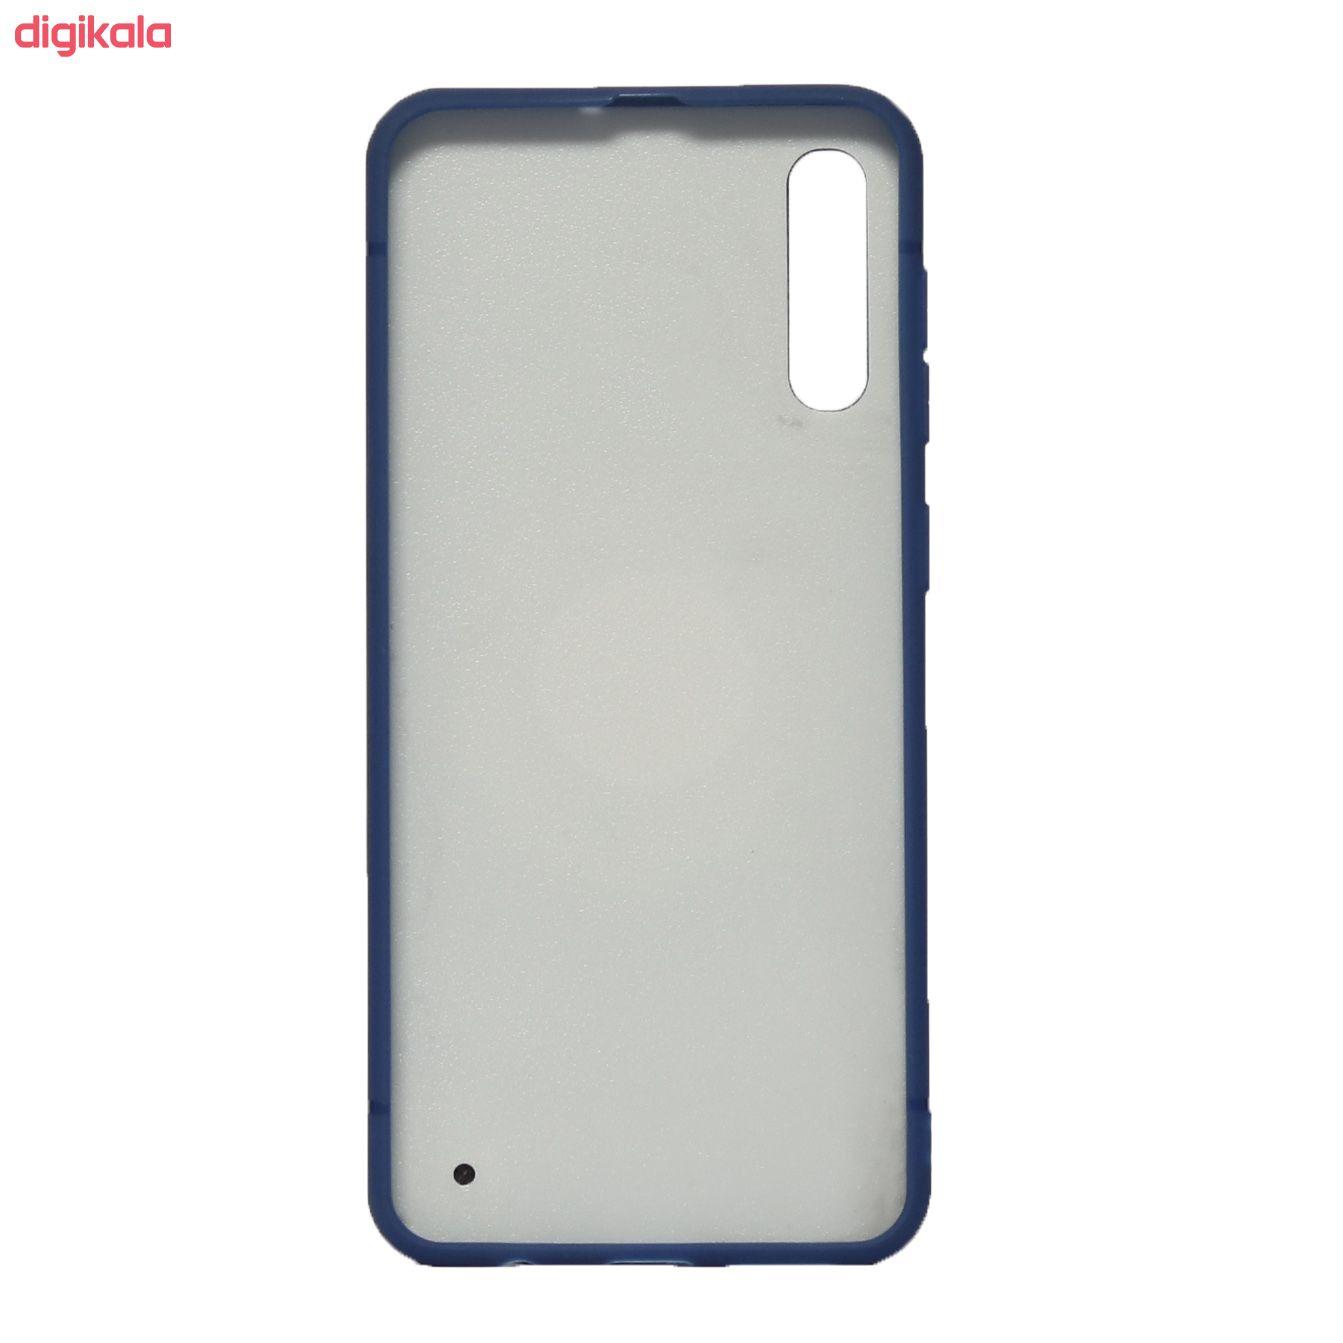 کاور طرح الماس مدل mr-506 مناسب برای گوشی موبایل سامسونگ Galaxy A50/A50s/a30s main 1 5